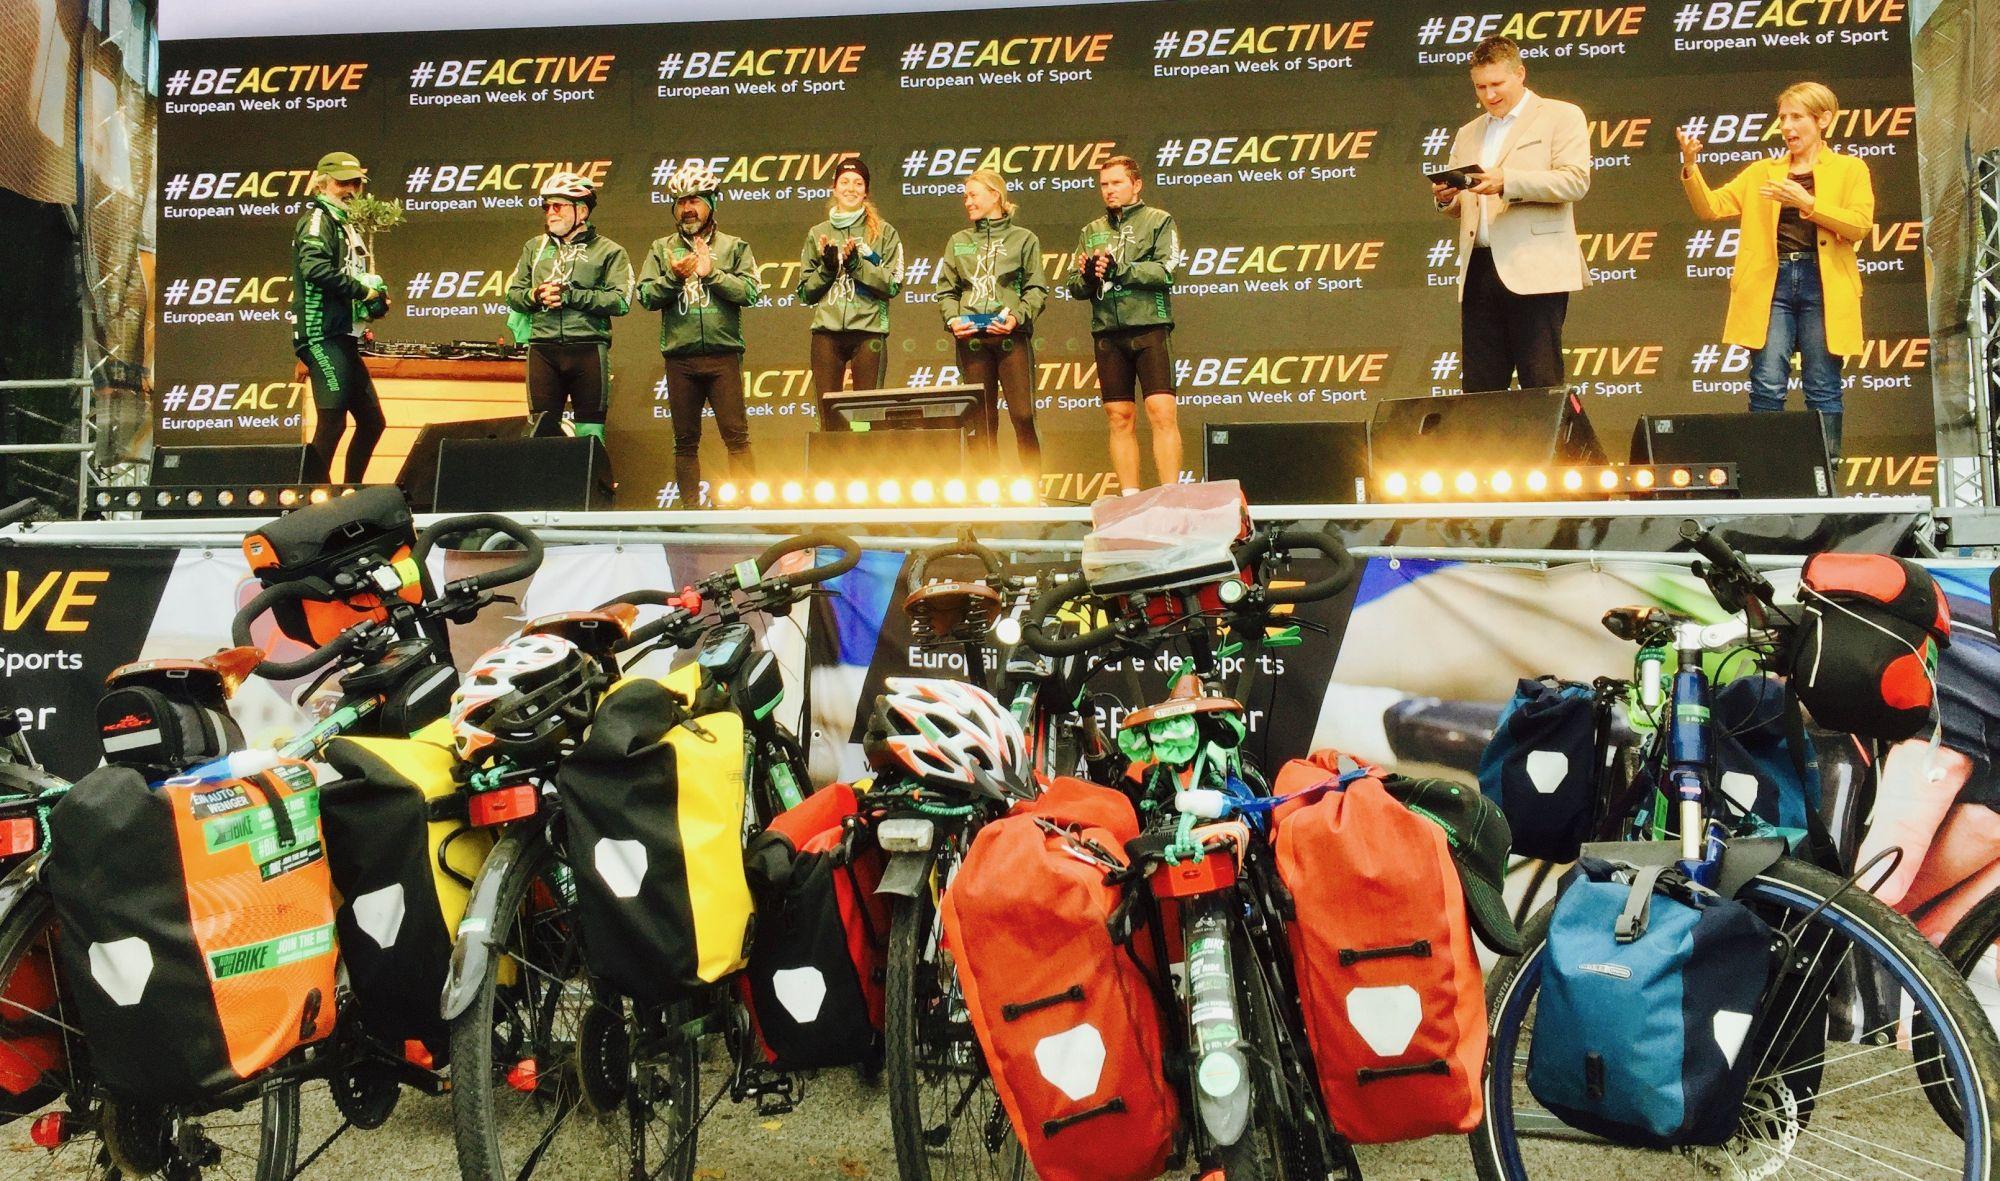 european-week-of-sports-beactive_Buehne-3.jpg